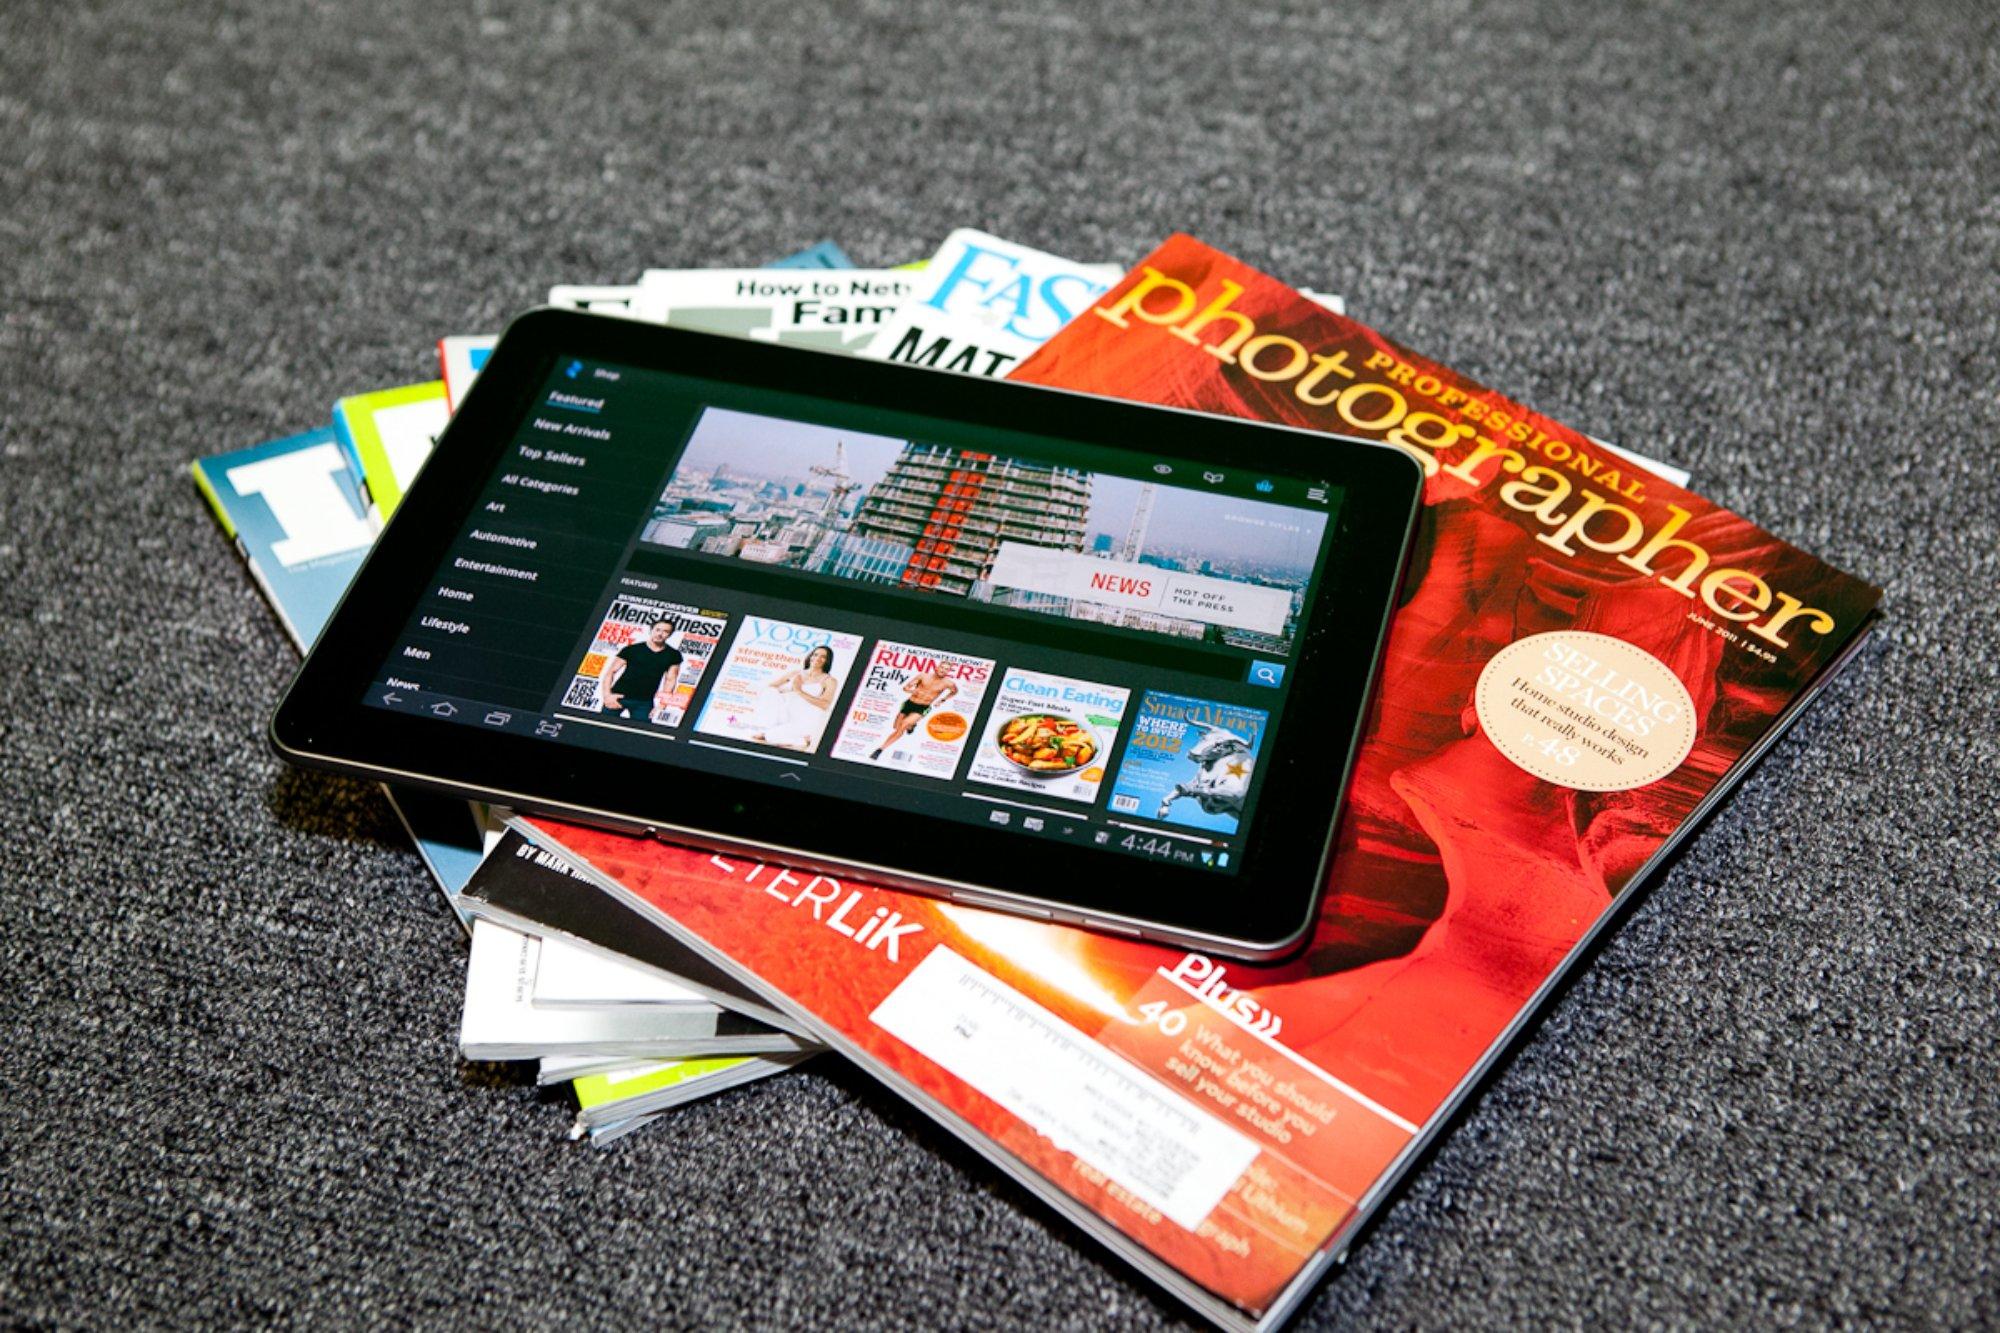 White Paper: Print Marketing in a Digital World